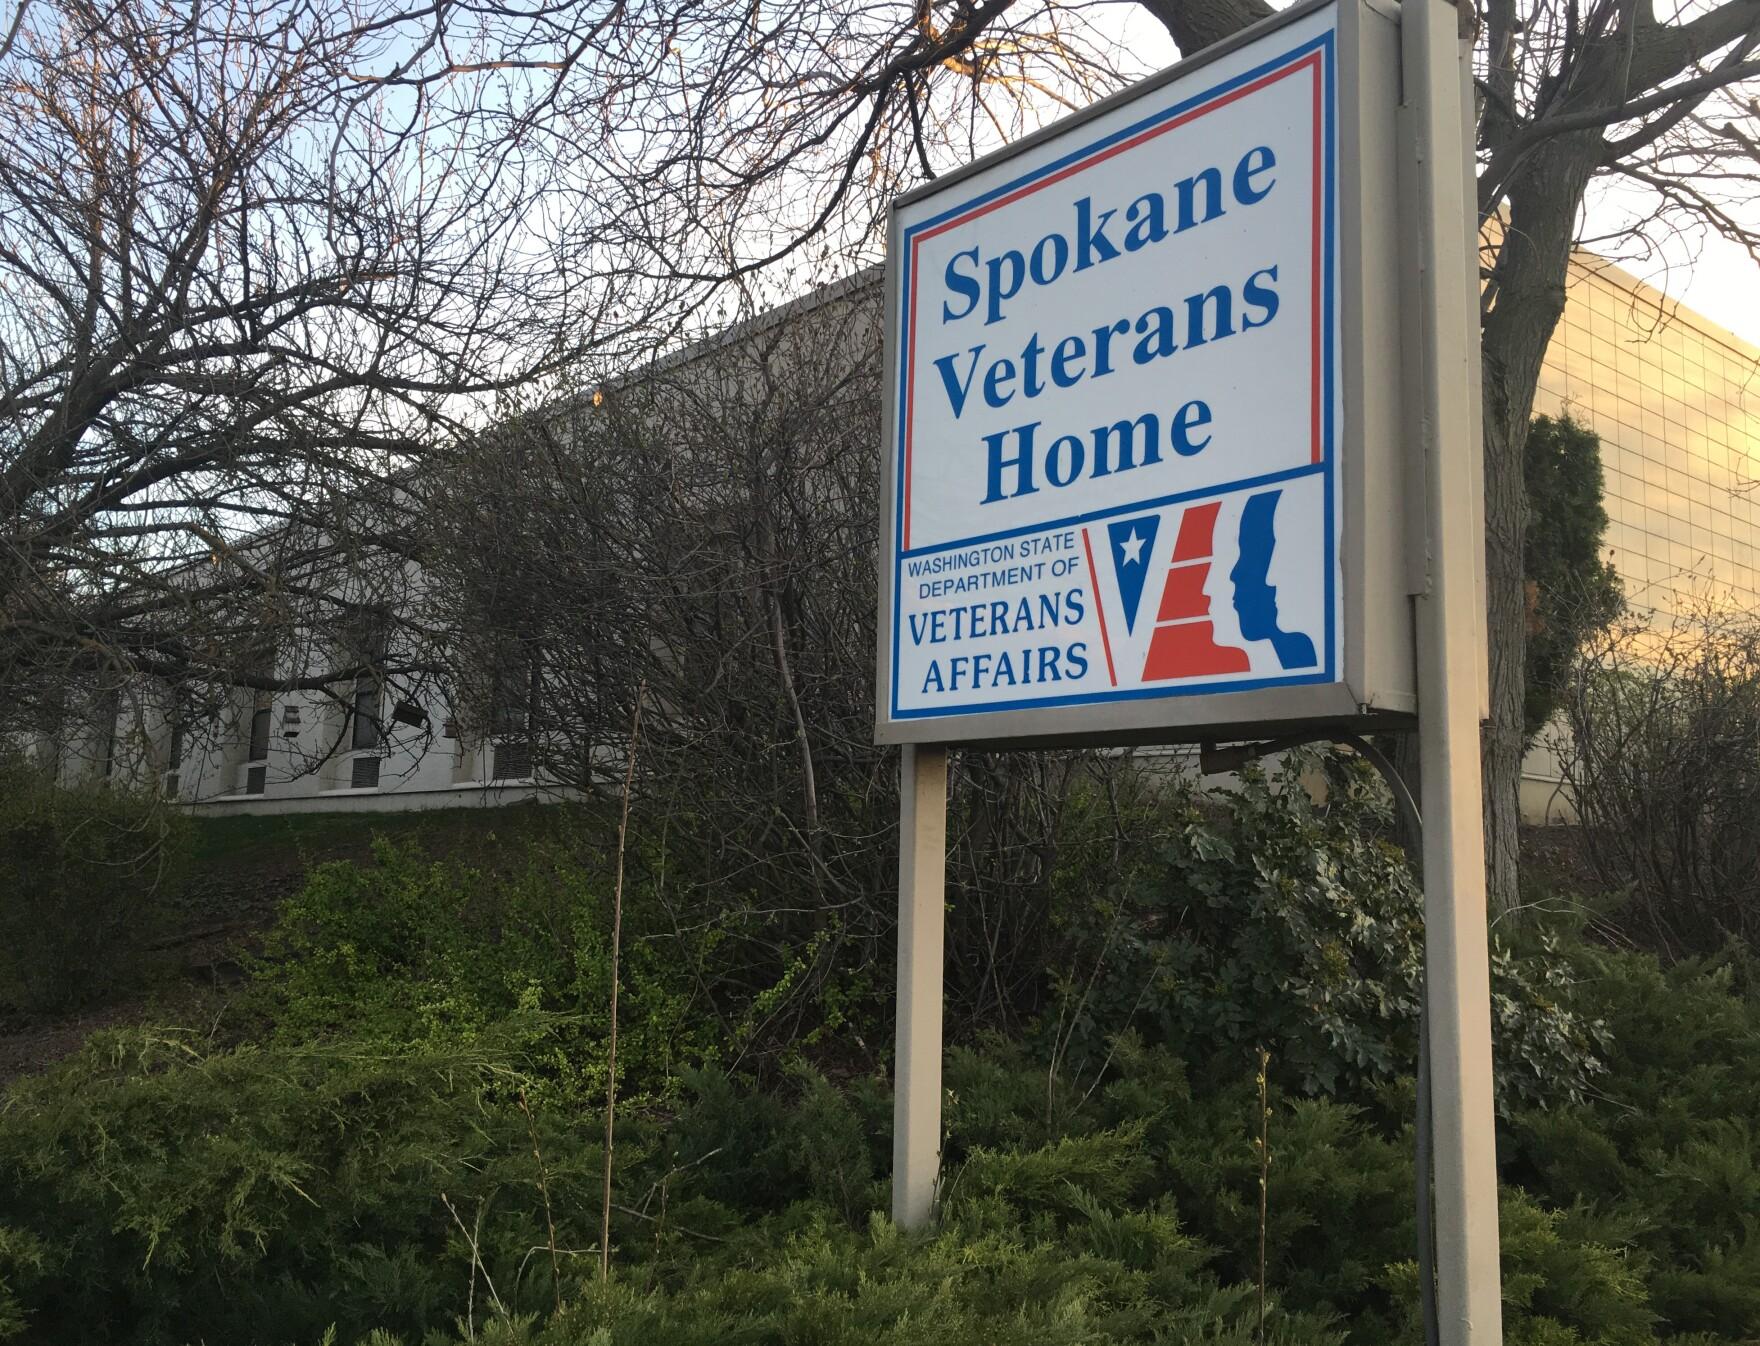 The Spokane Veterans Homes sign outside their building.